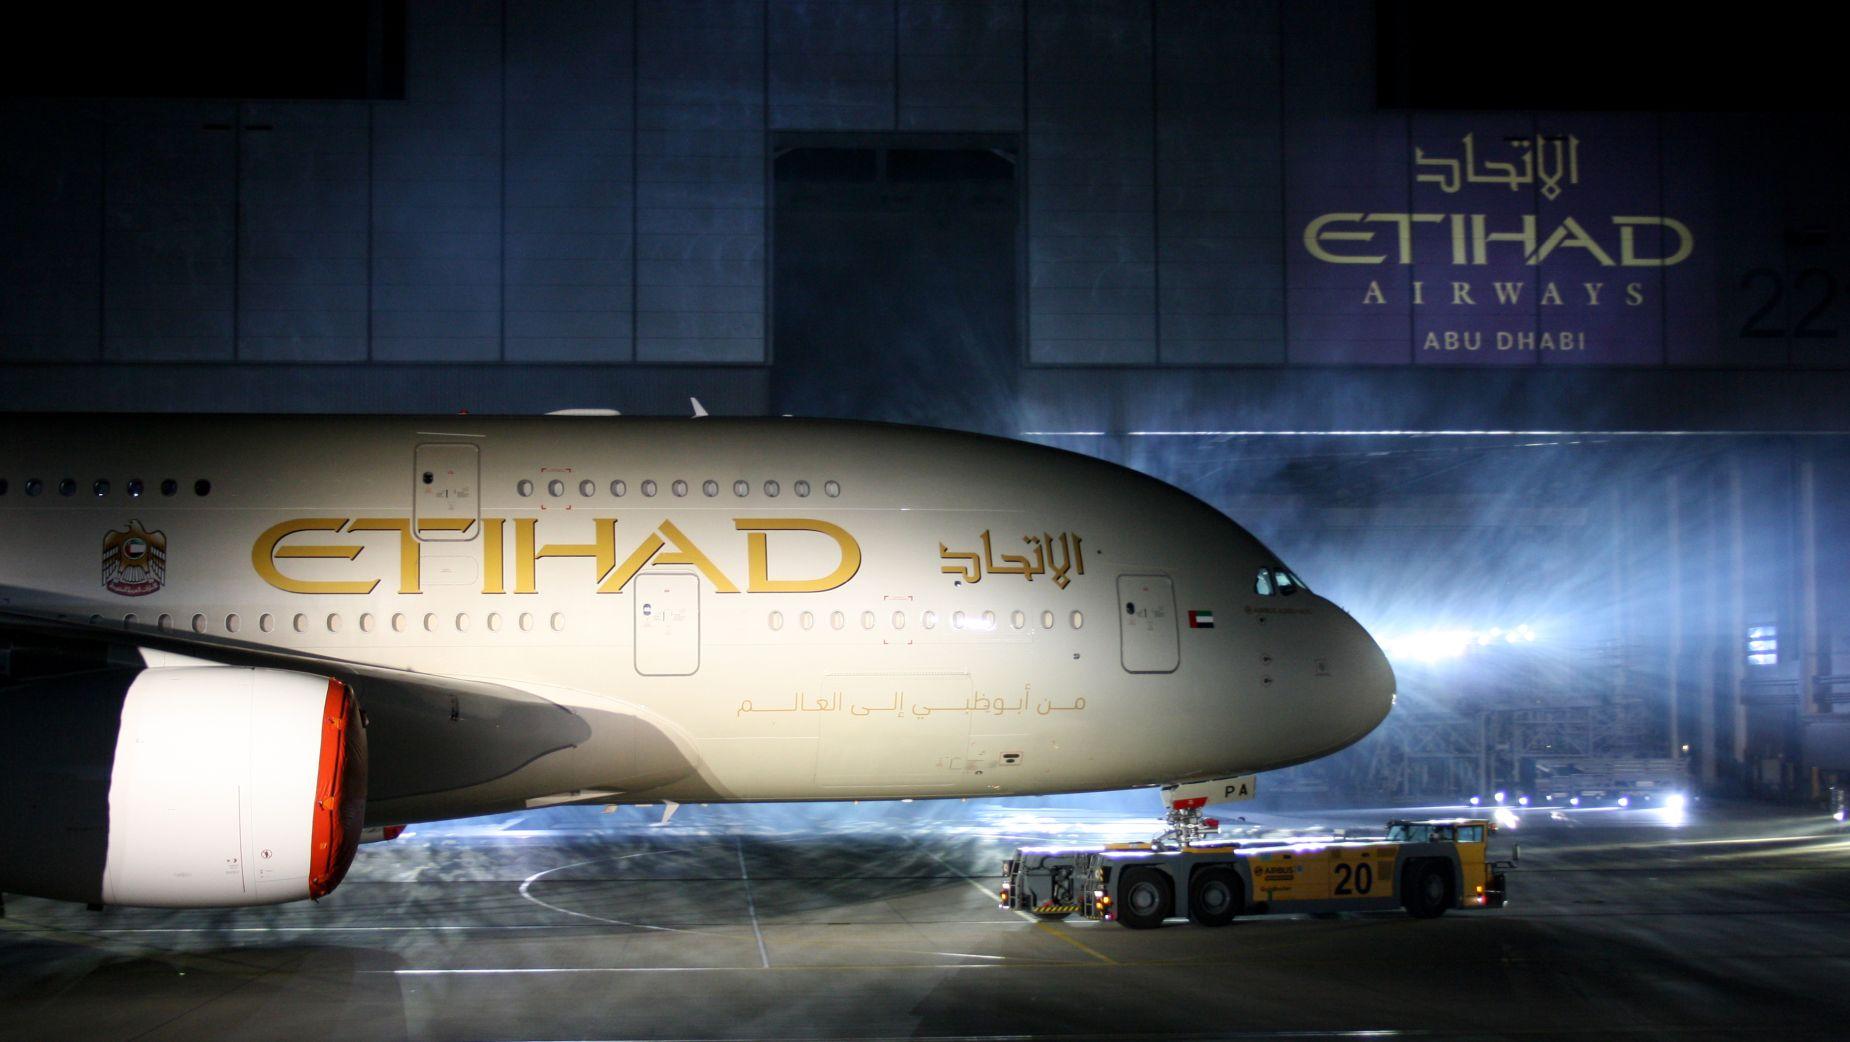 Samolot Etihad